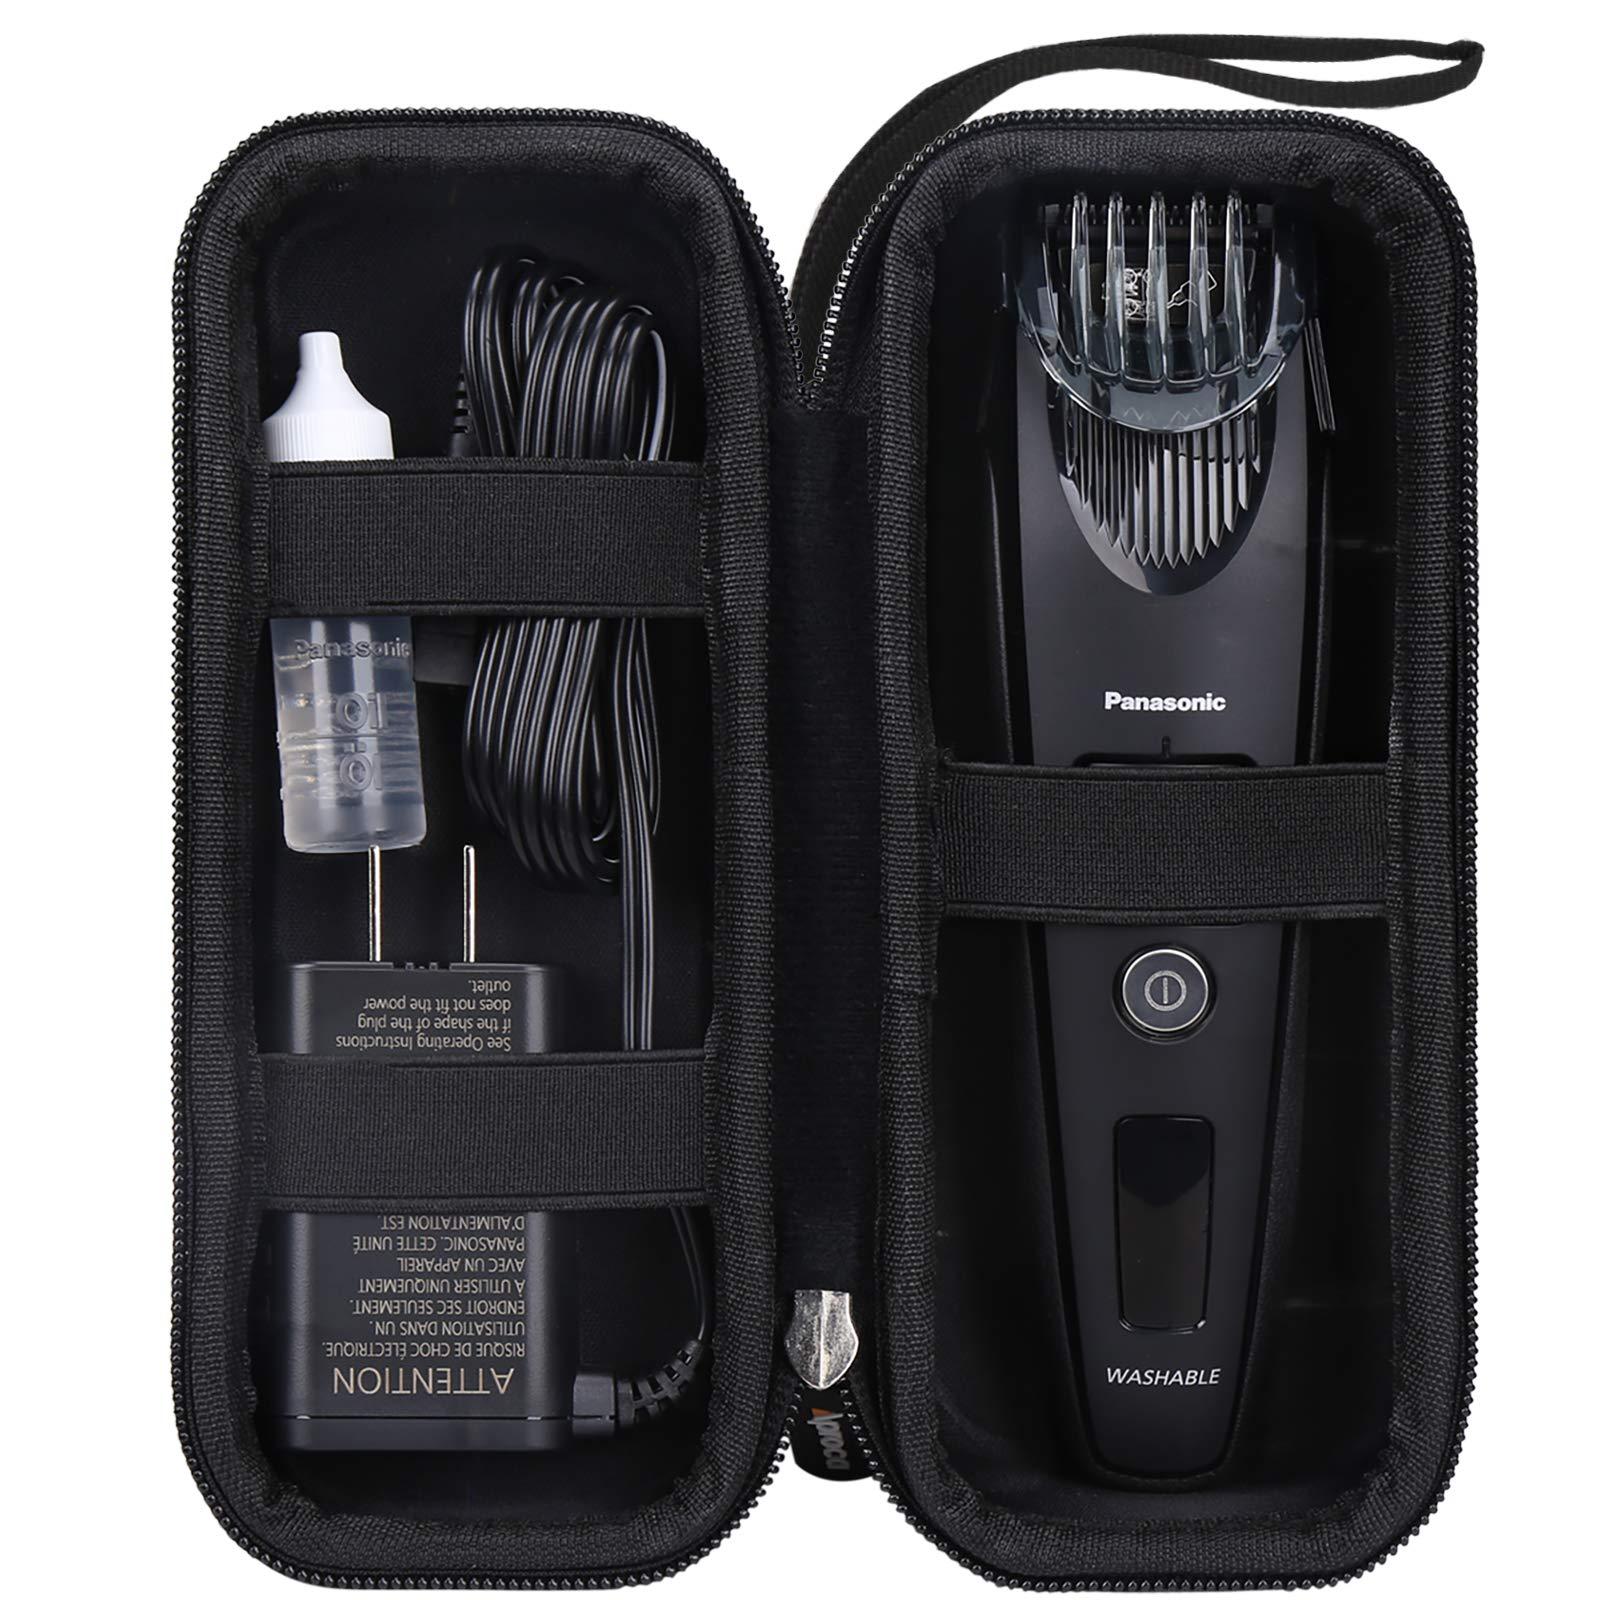 Aproca Hard Storage Travel Case For Panasonic ER-SB40-K/Remington MB4700 Beard Trimmer